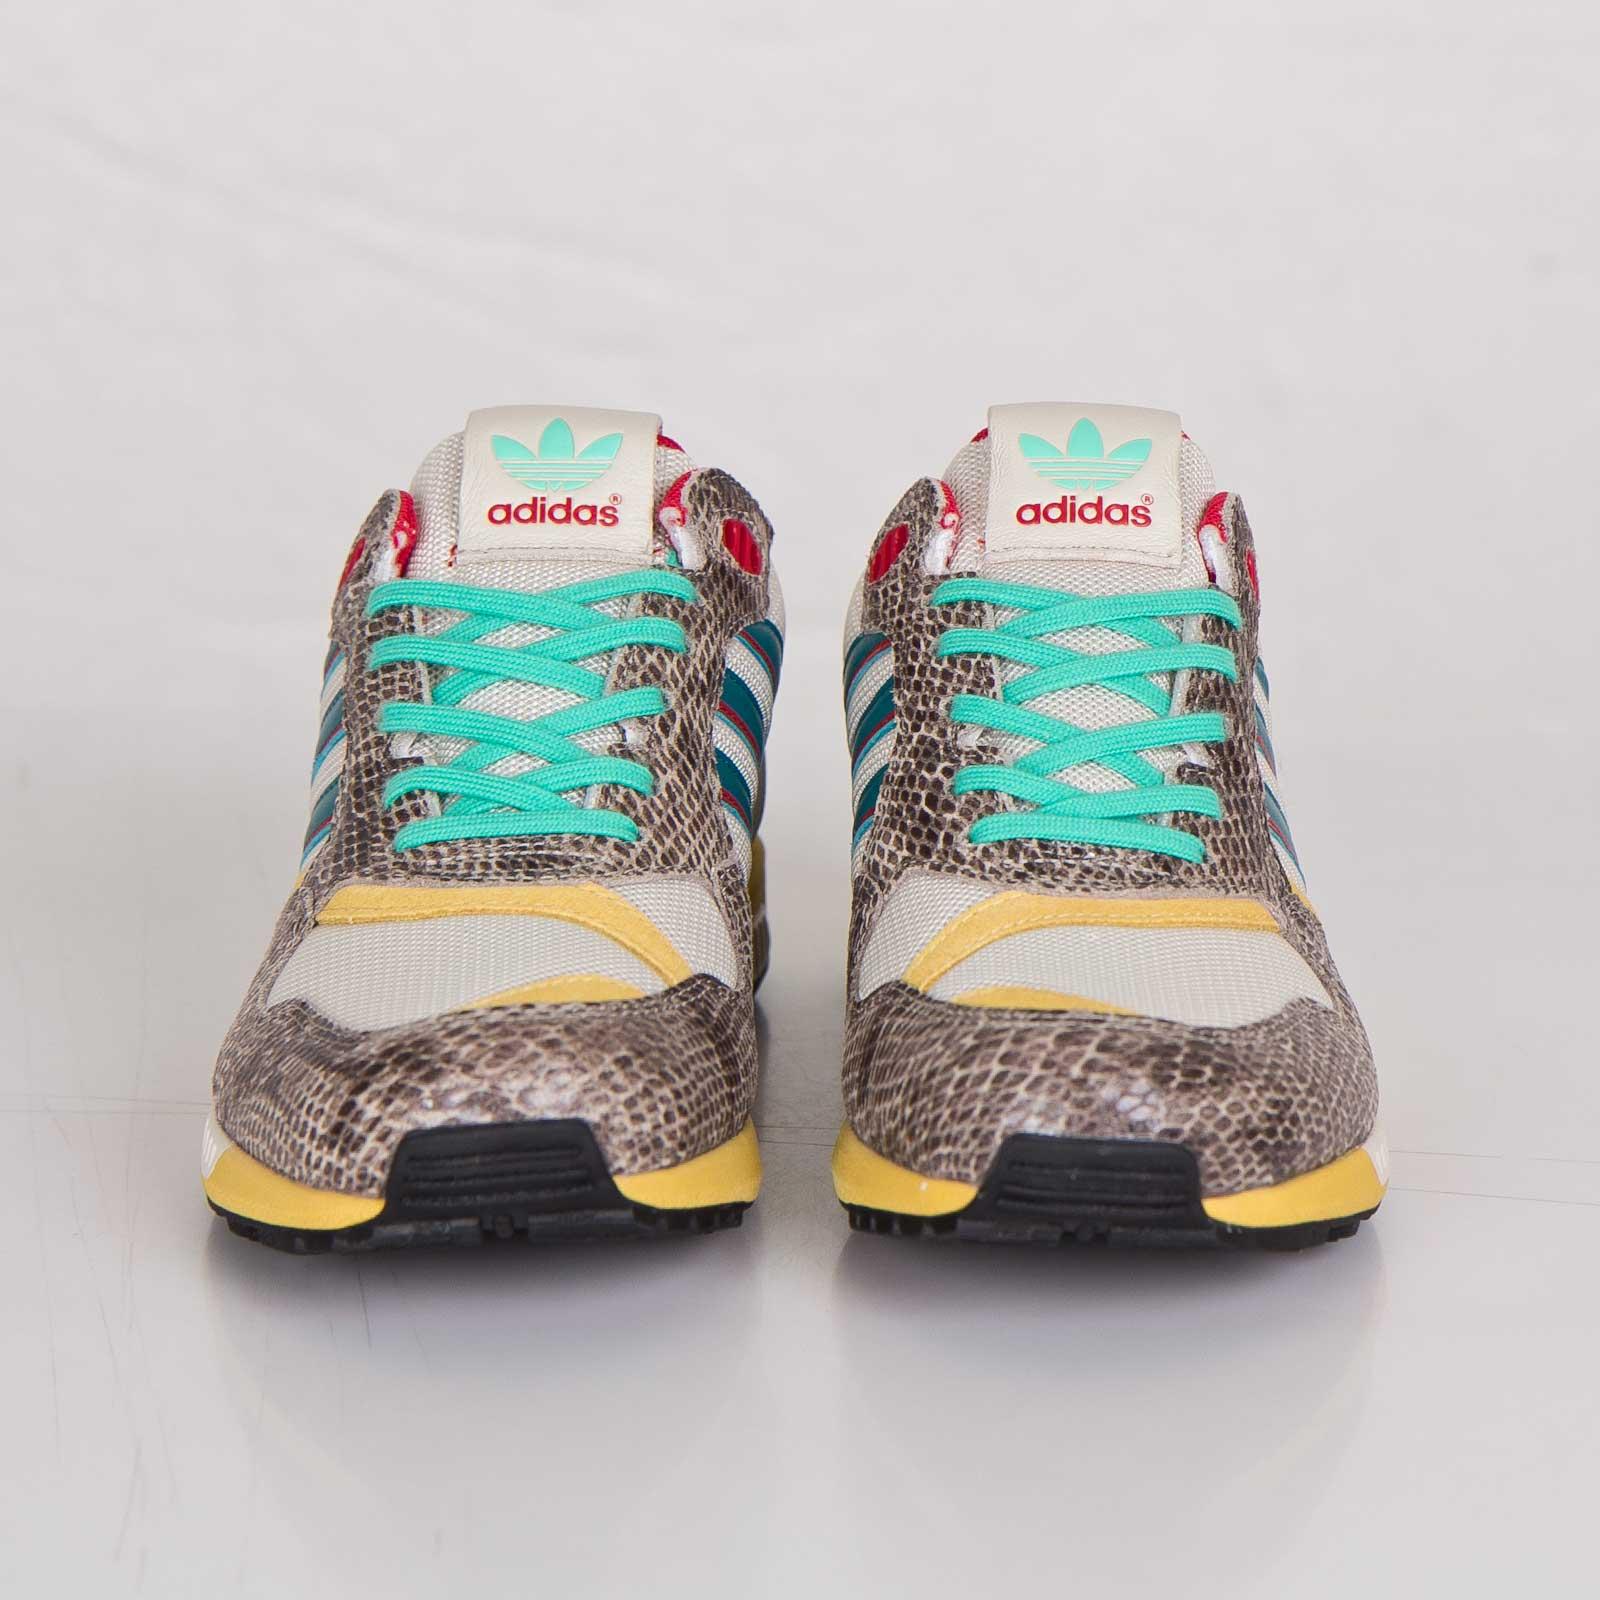 acef9ea86d3eb adidas ZX 6000 W - M25116 - Sneakersnstuff